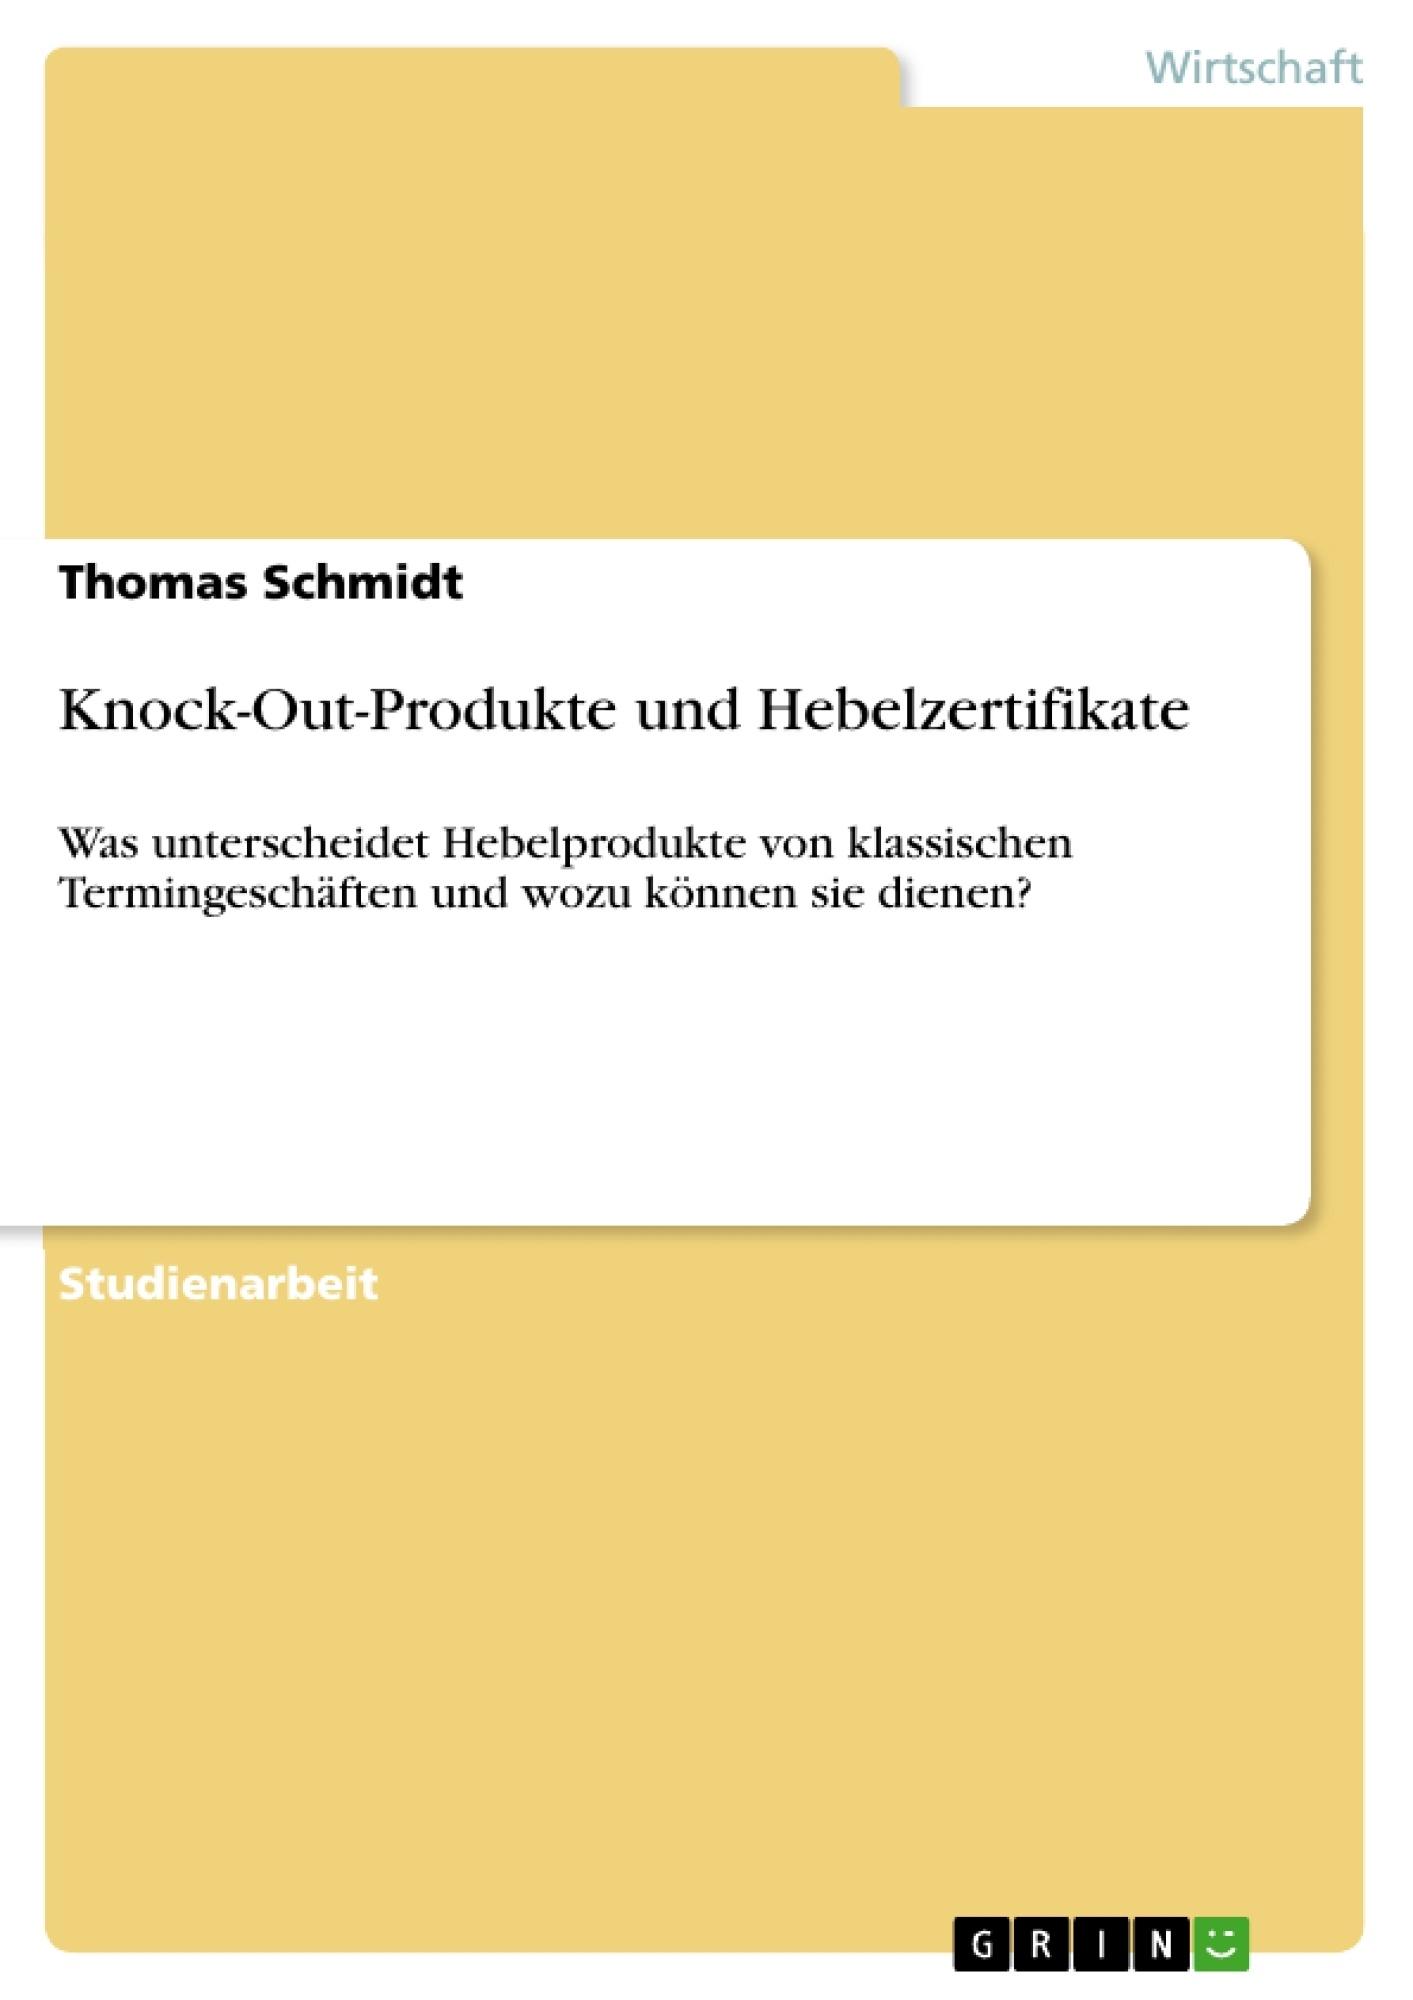 Titel: Knock-Out-Produkte und Hebelzertifikate